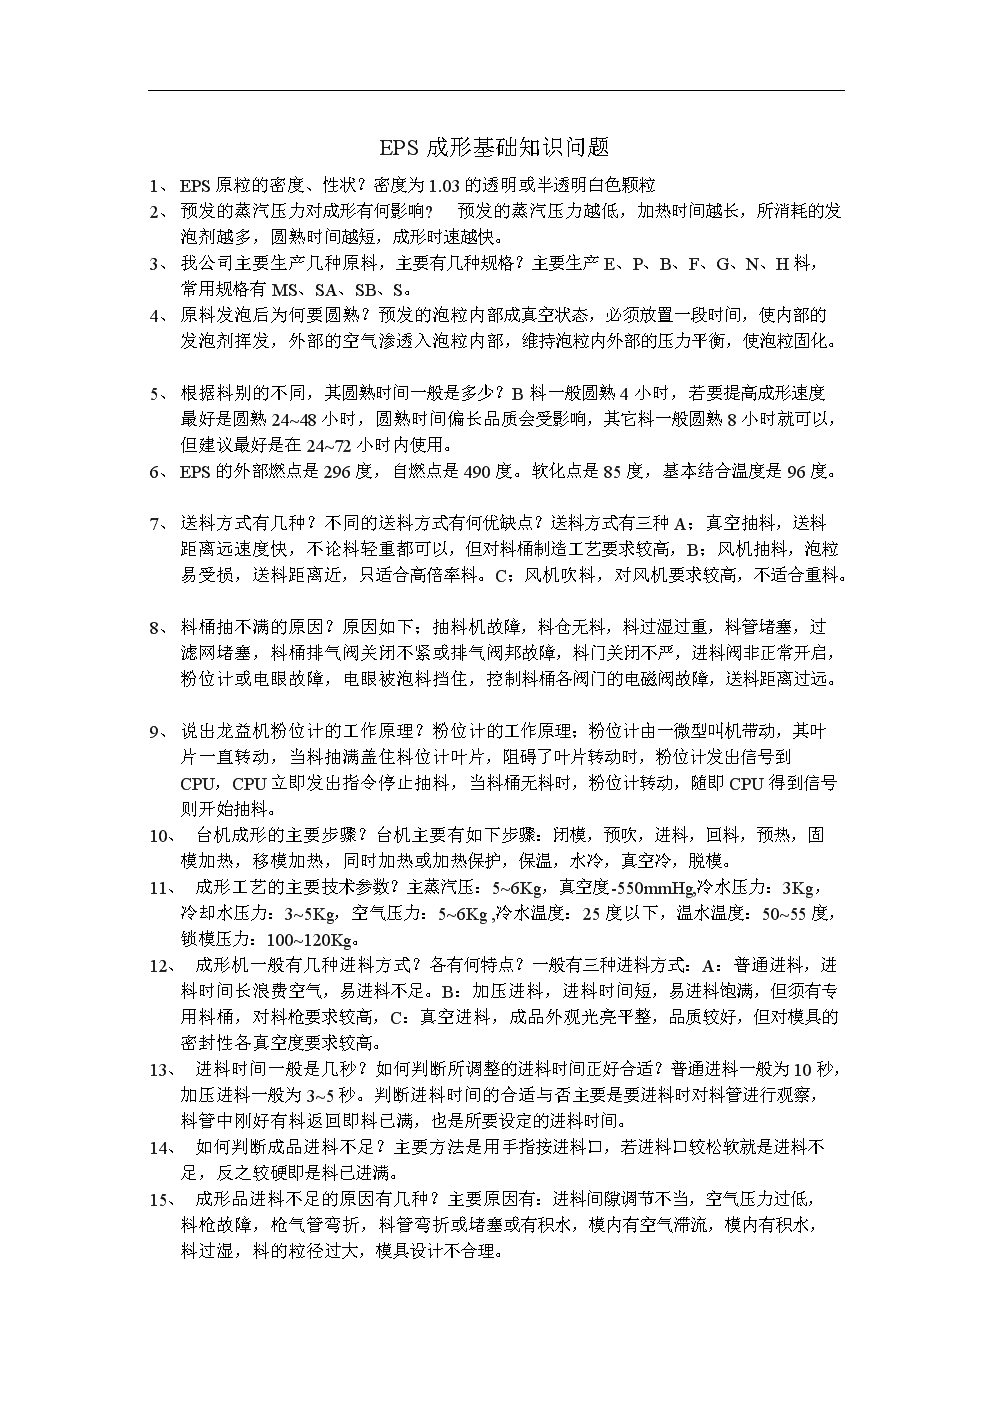 EPS成形复习知识点问题.doc